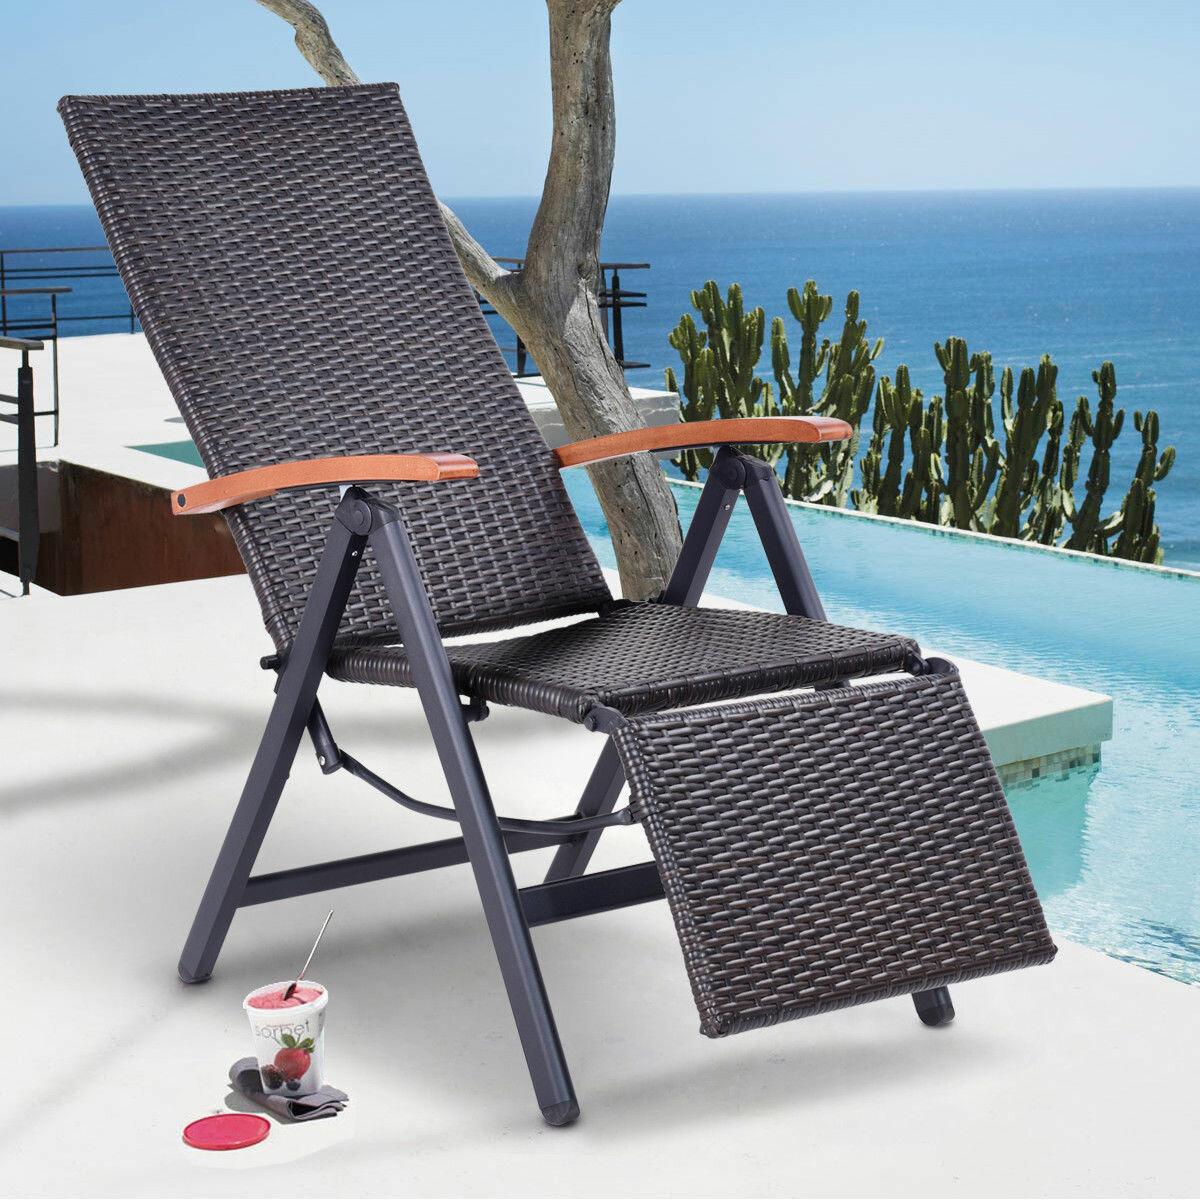 Widcombe Recliner Patio Chair